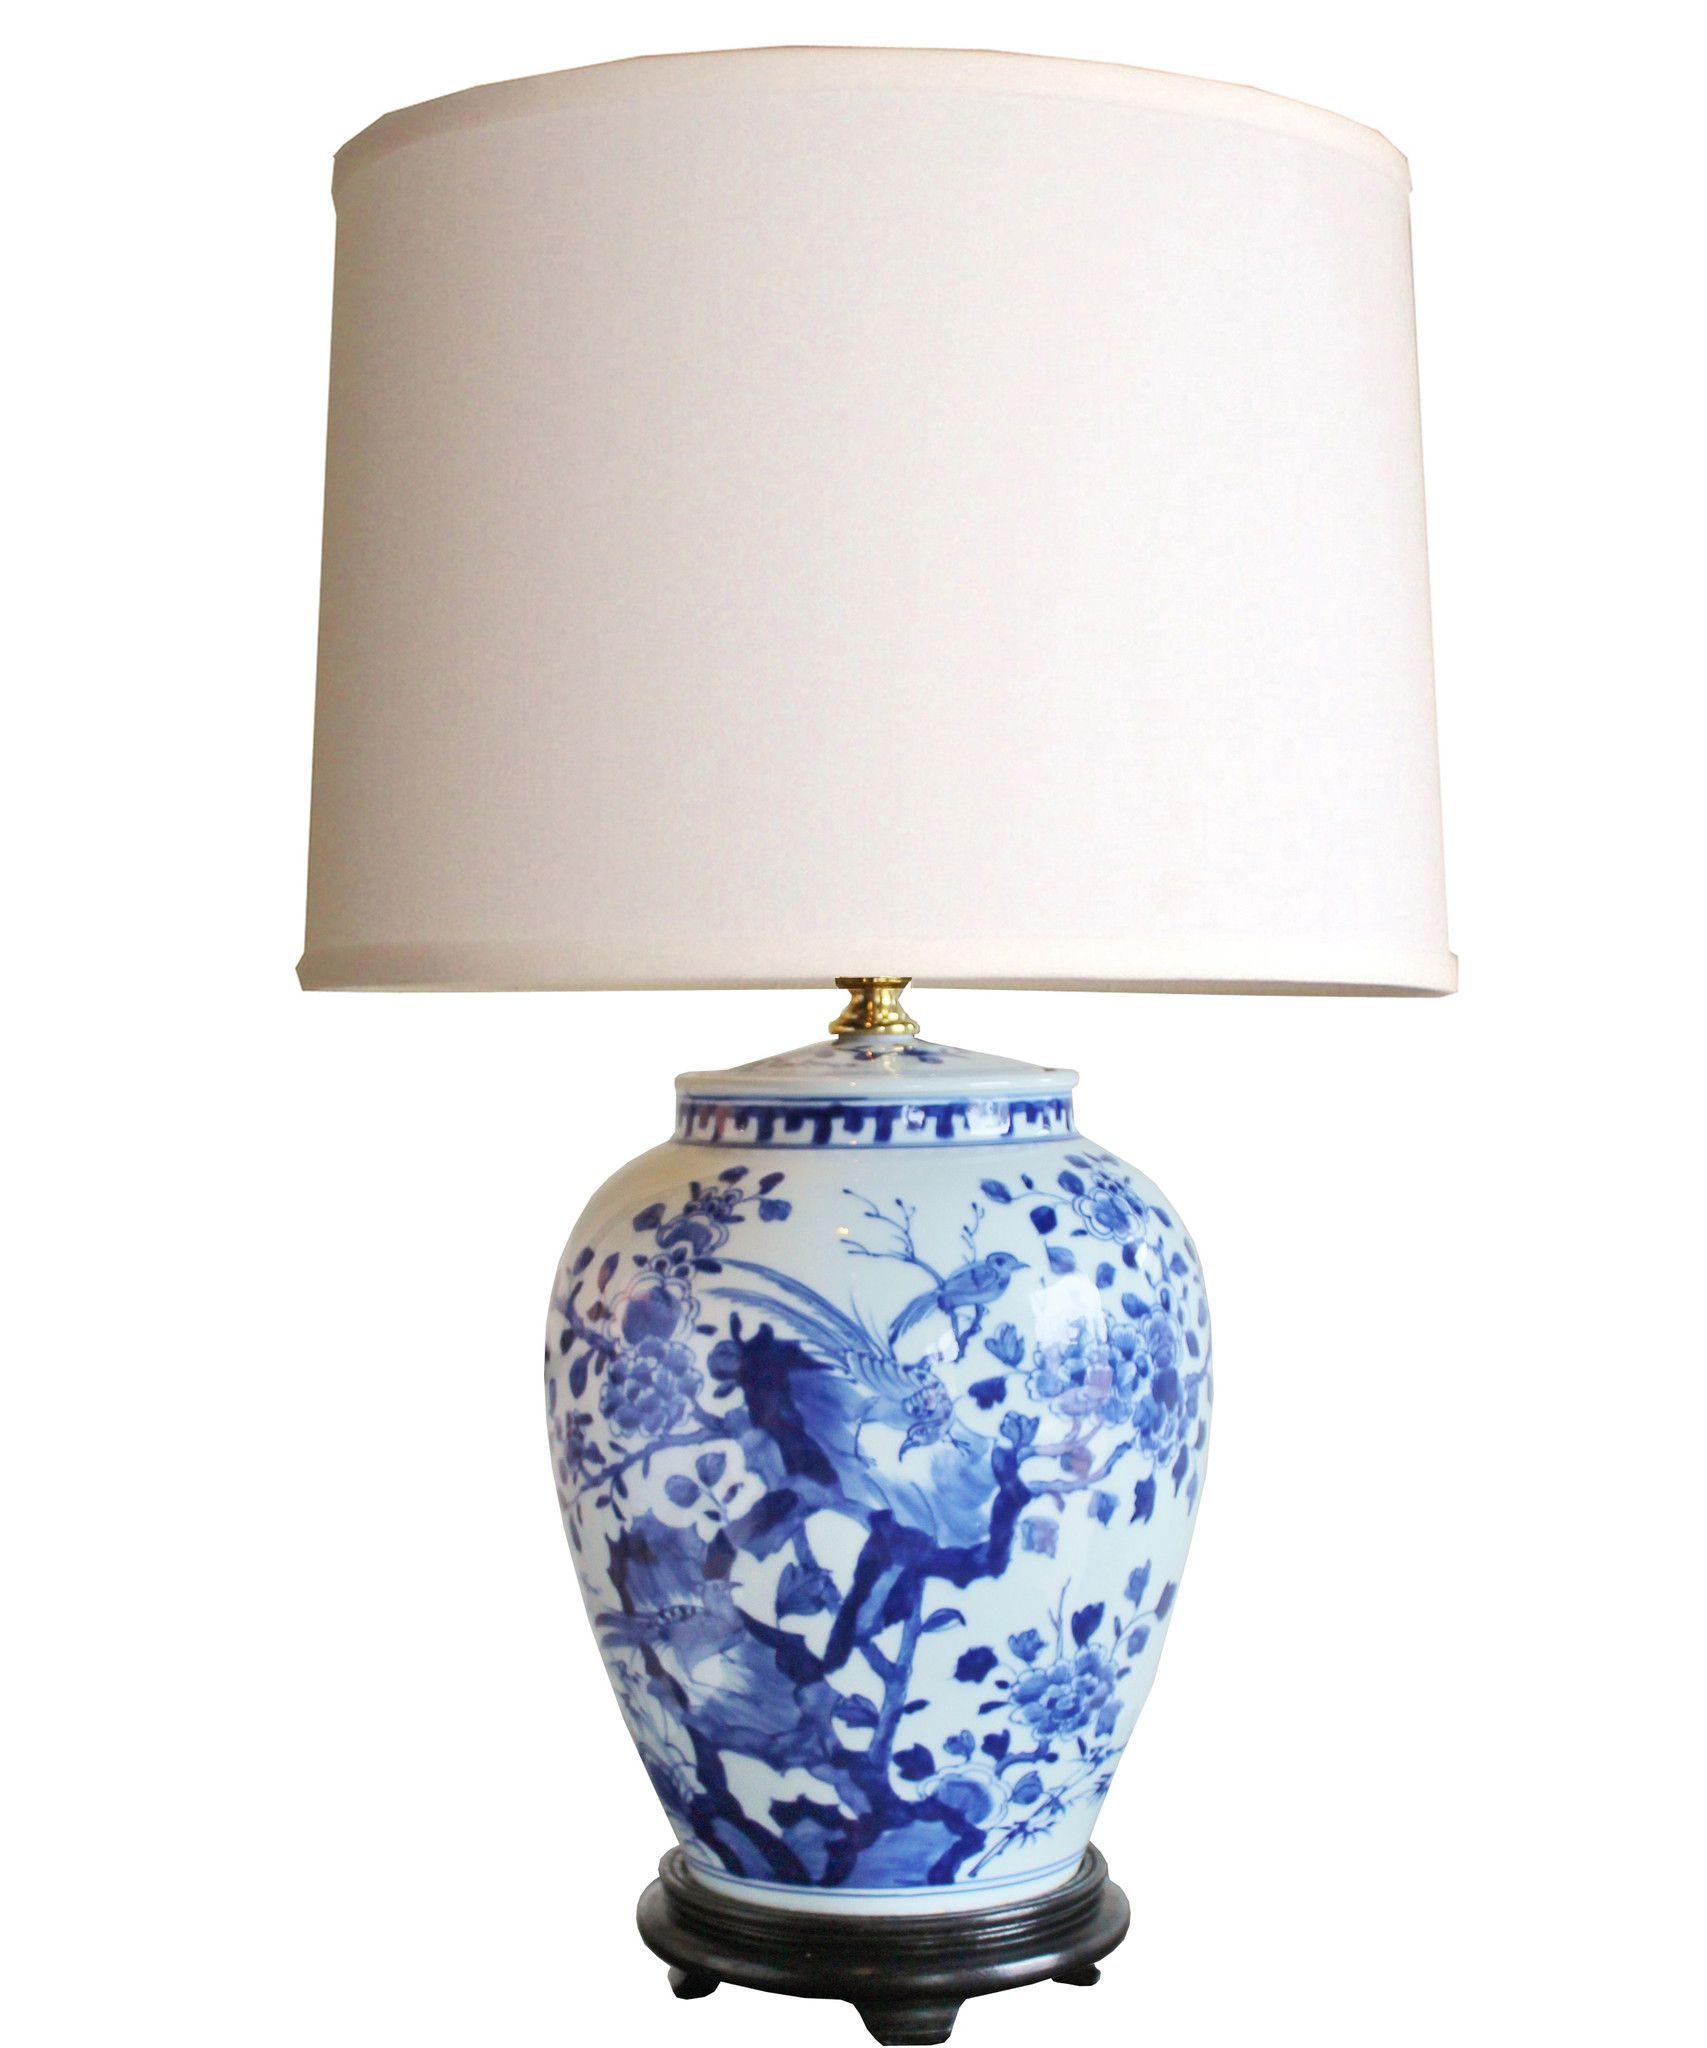 Blue U0026 White Porcelain Table Lamp